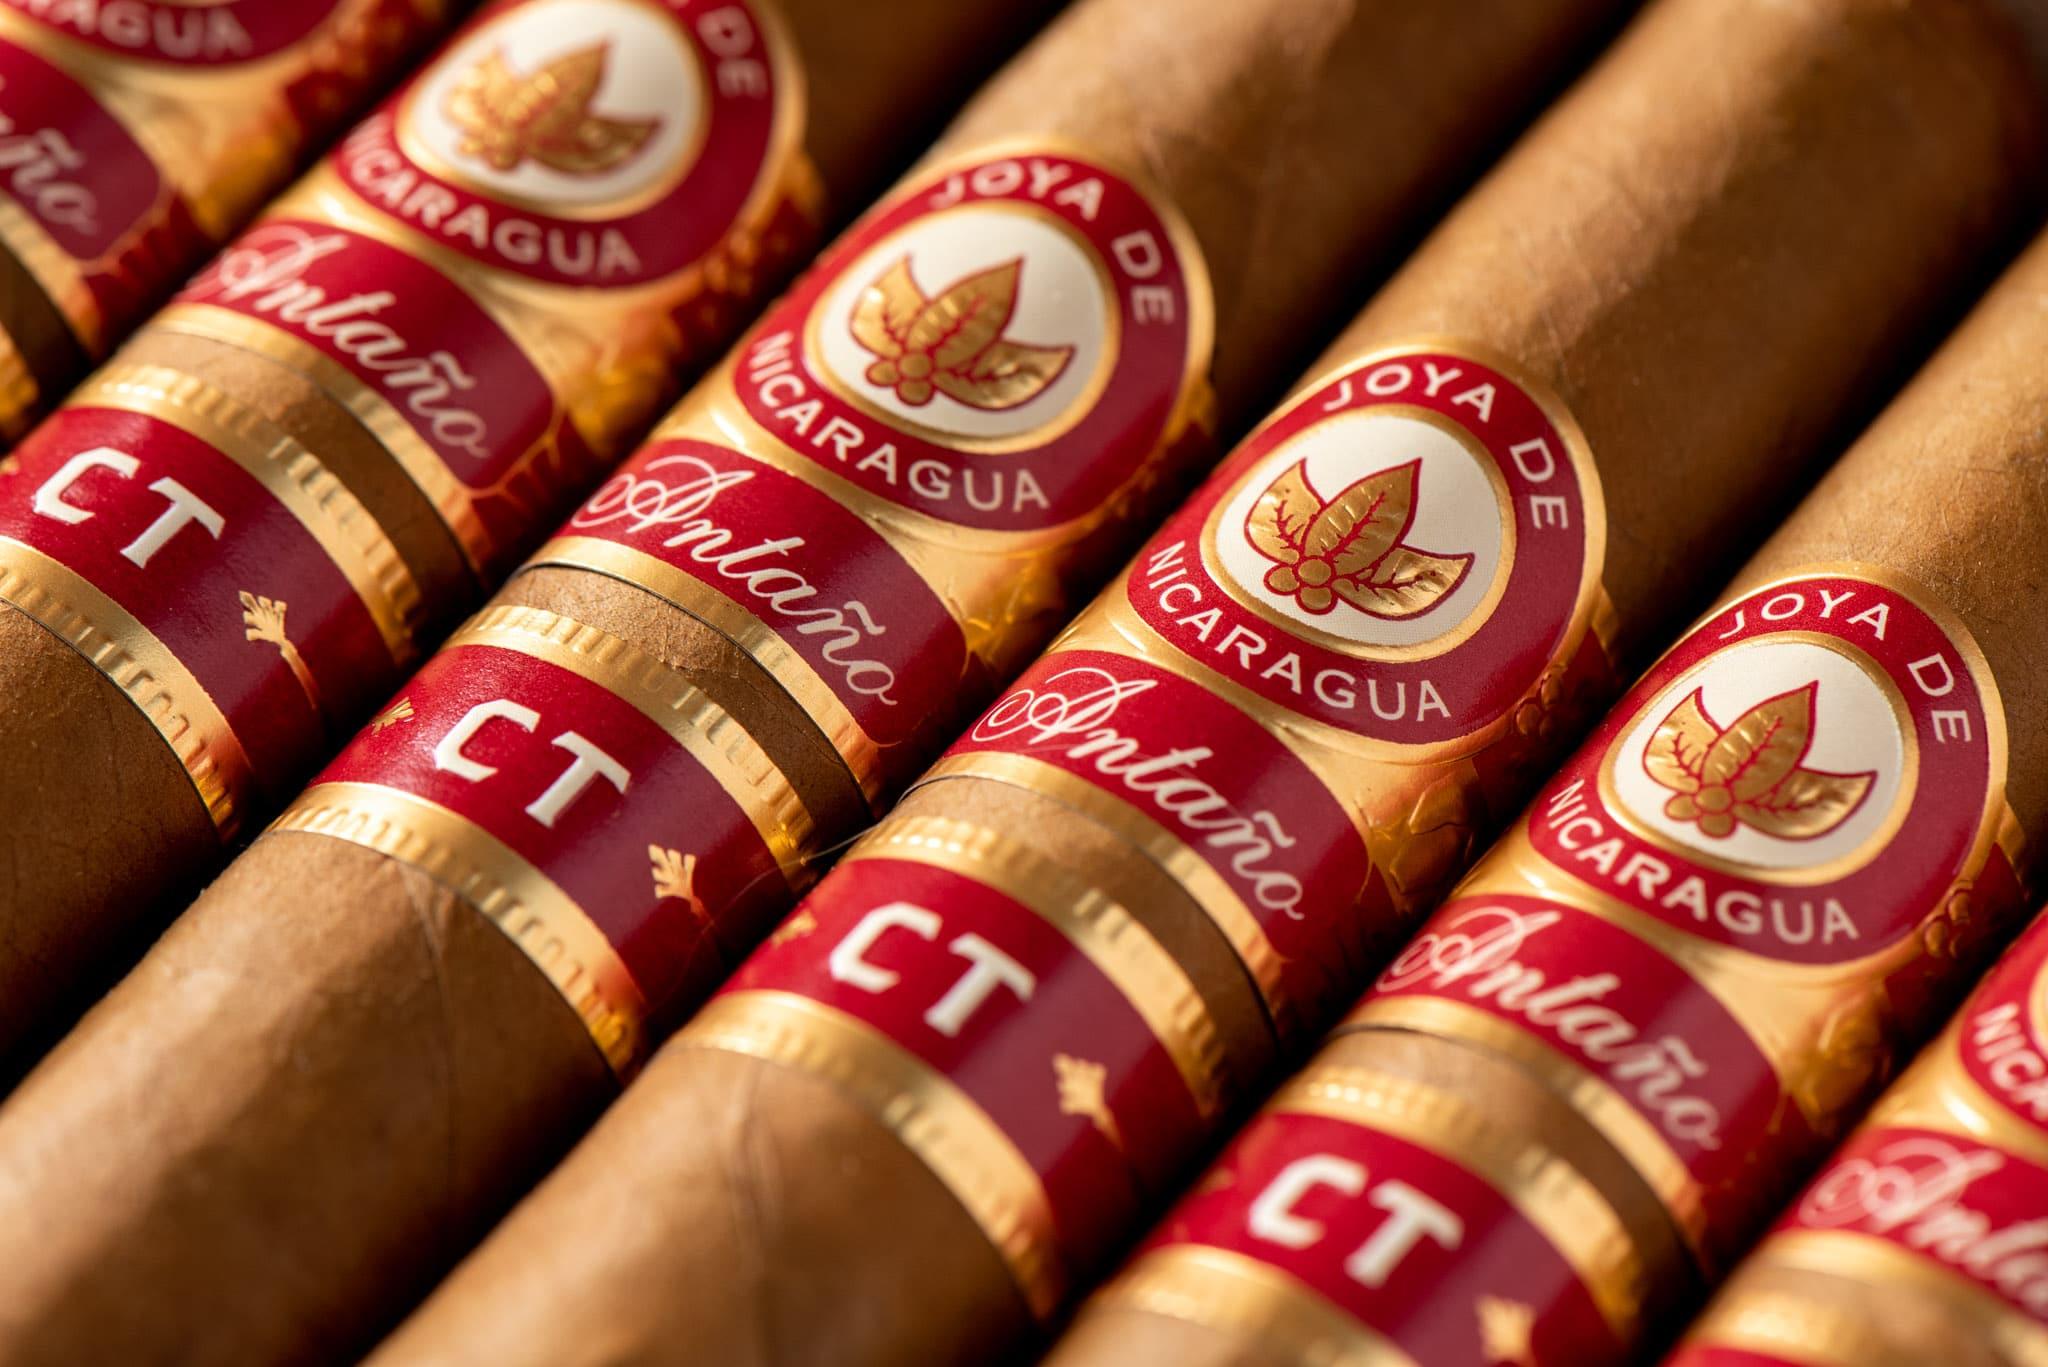 Joya de Nicaragua Antaño CT cigars